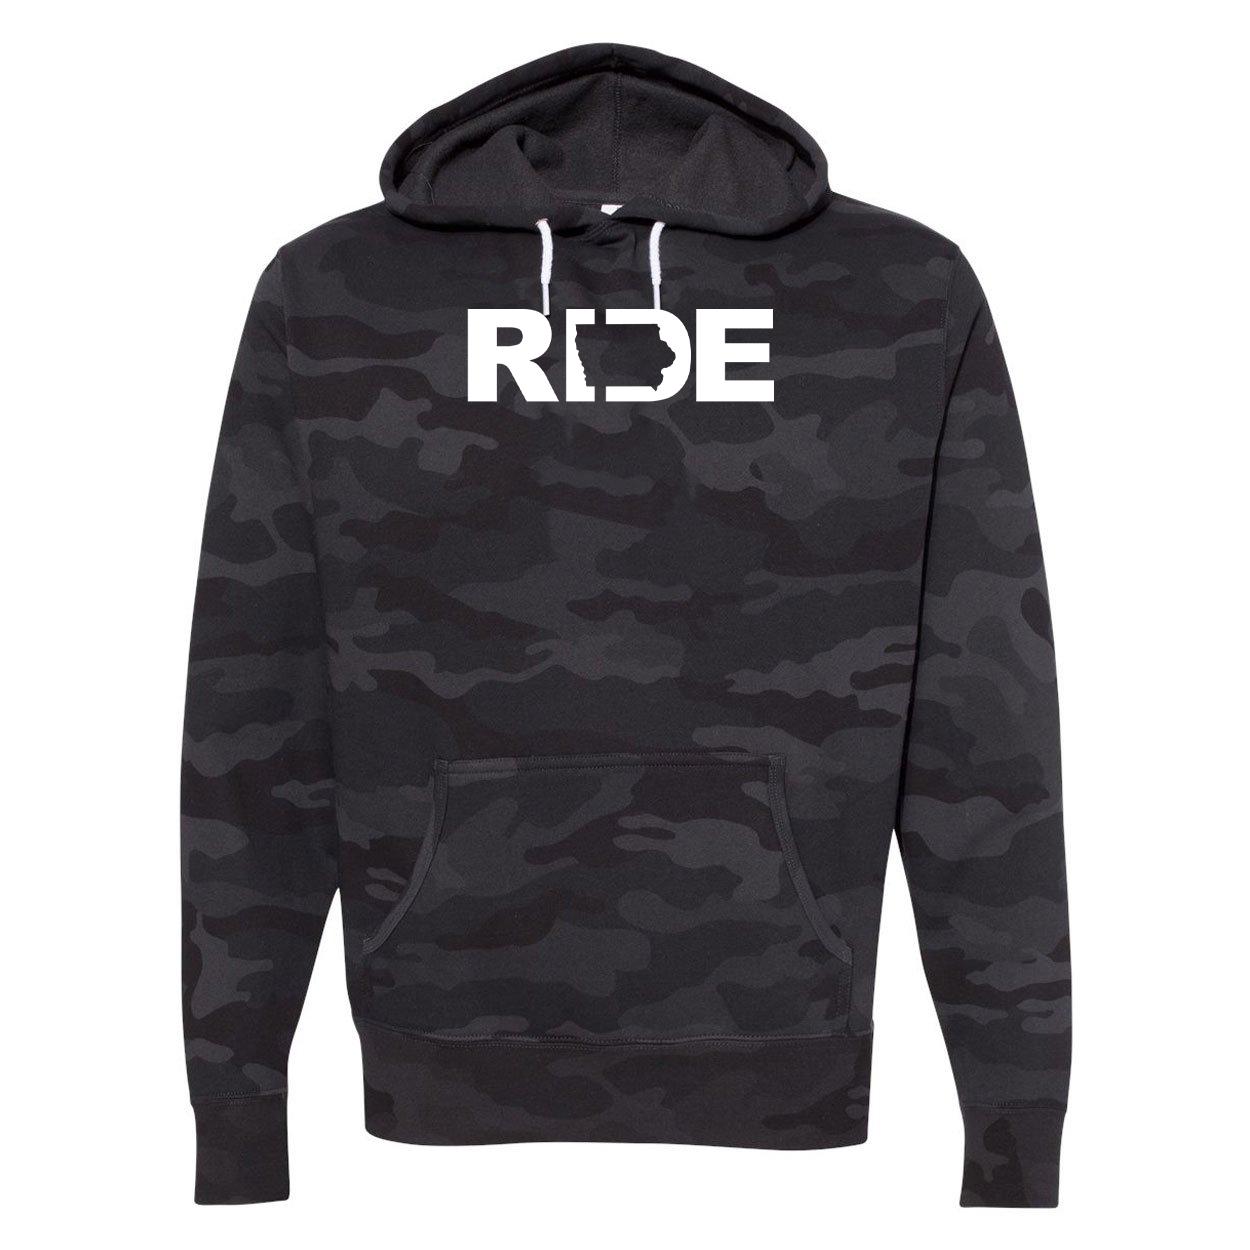 Ride Iowa Classic Unisex Hooded Sweatshirt Black Camo (White Logo)